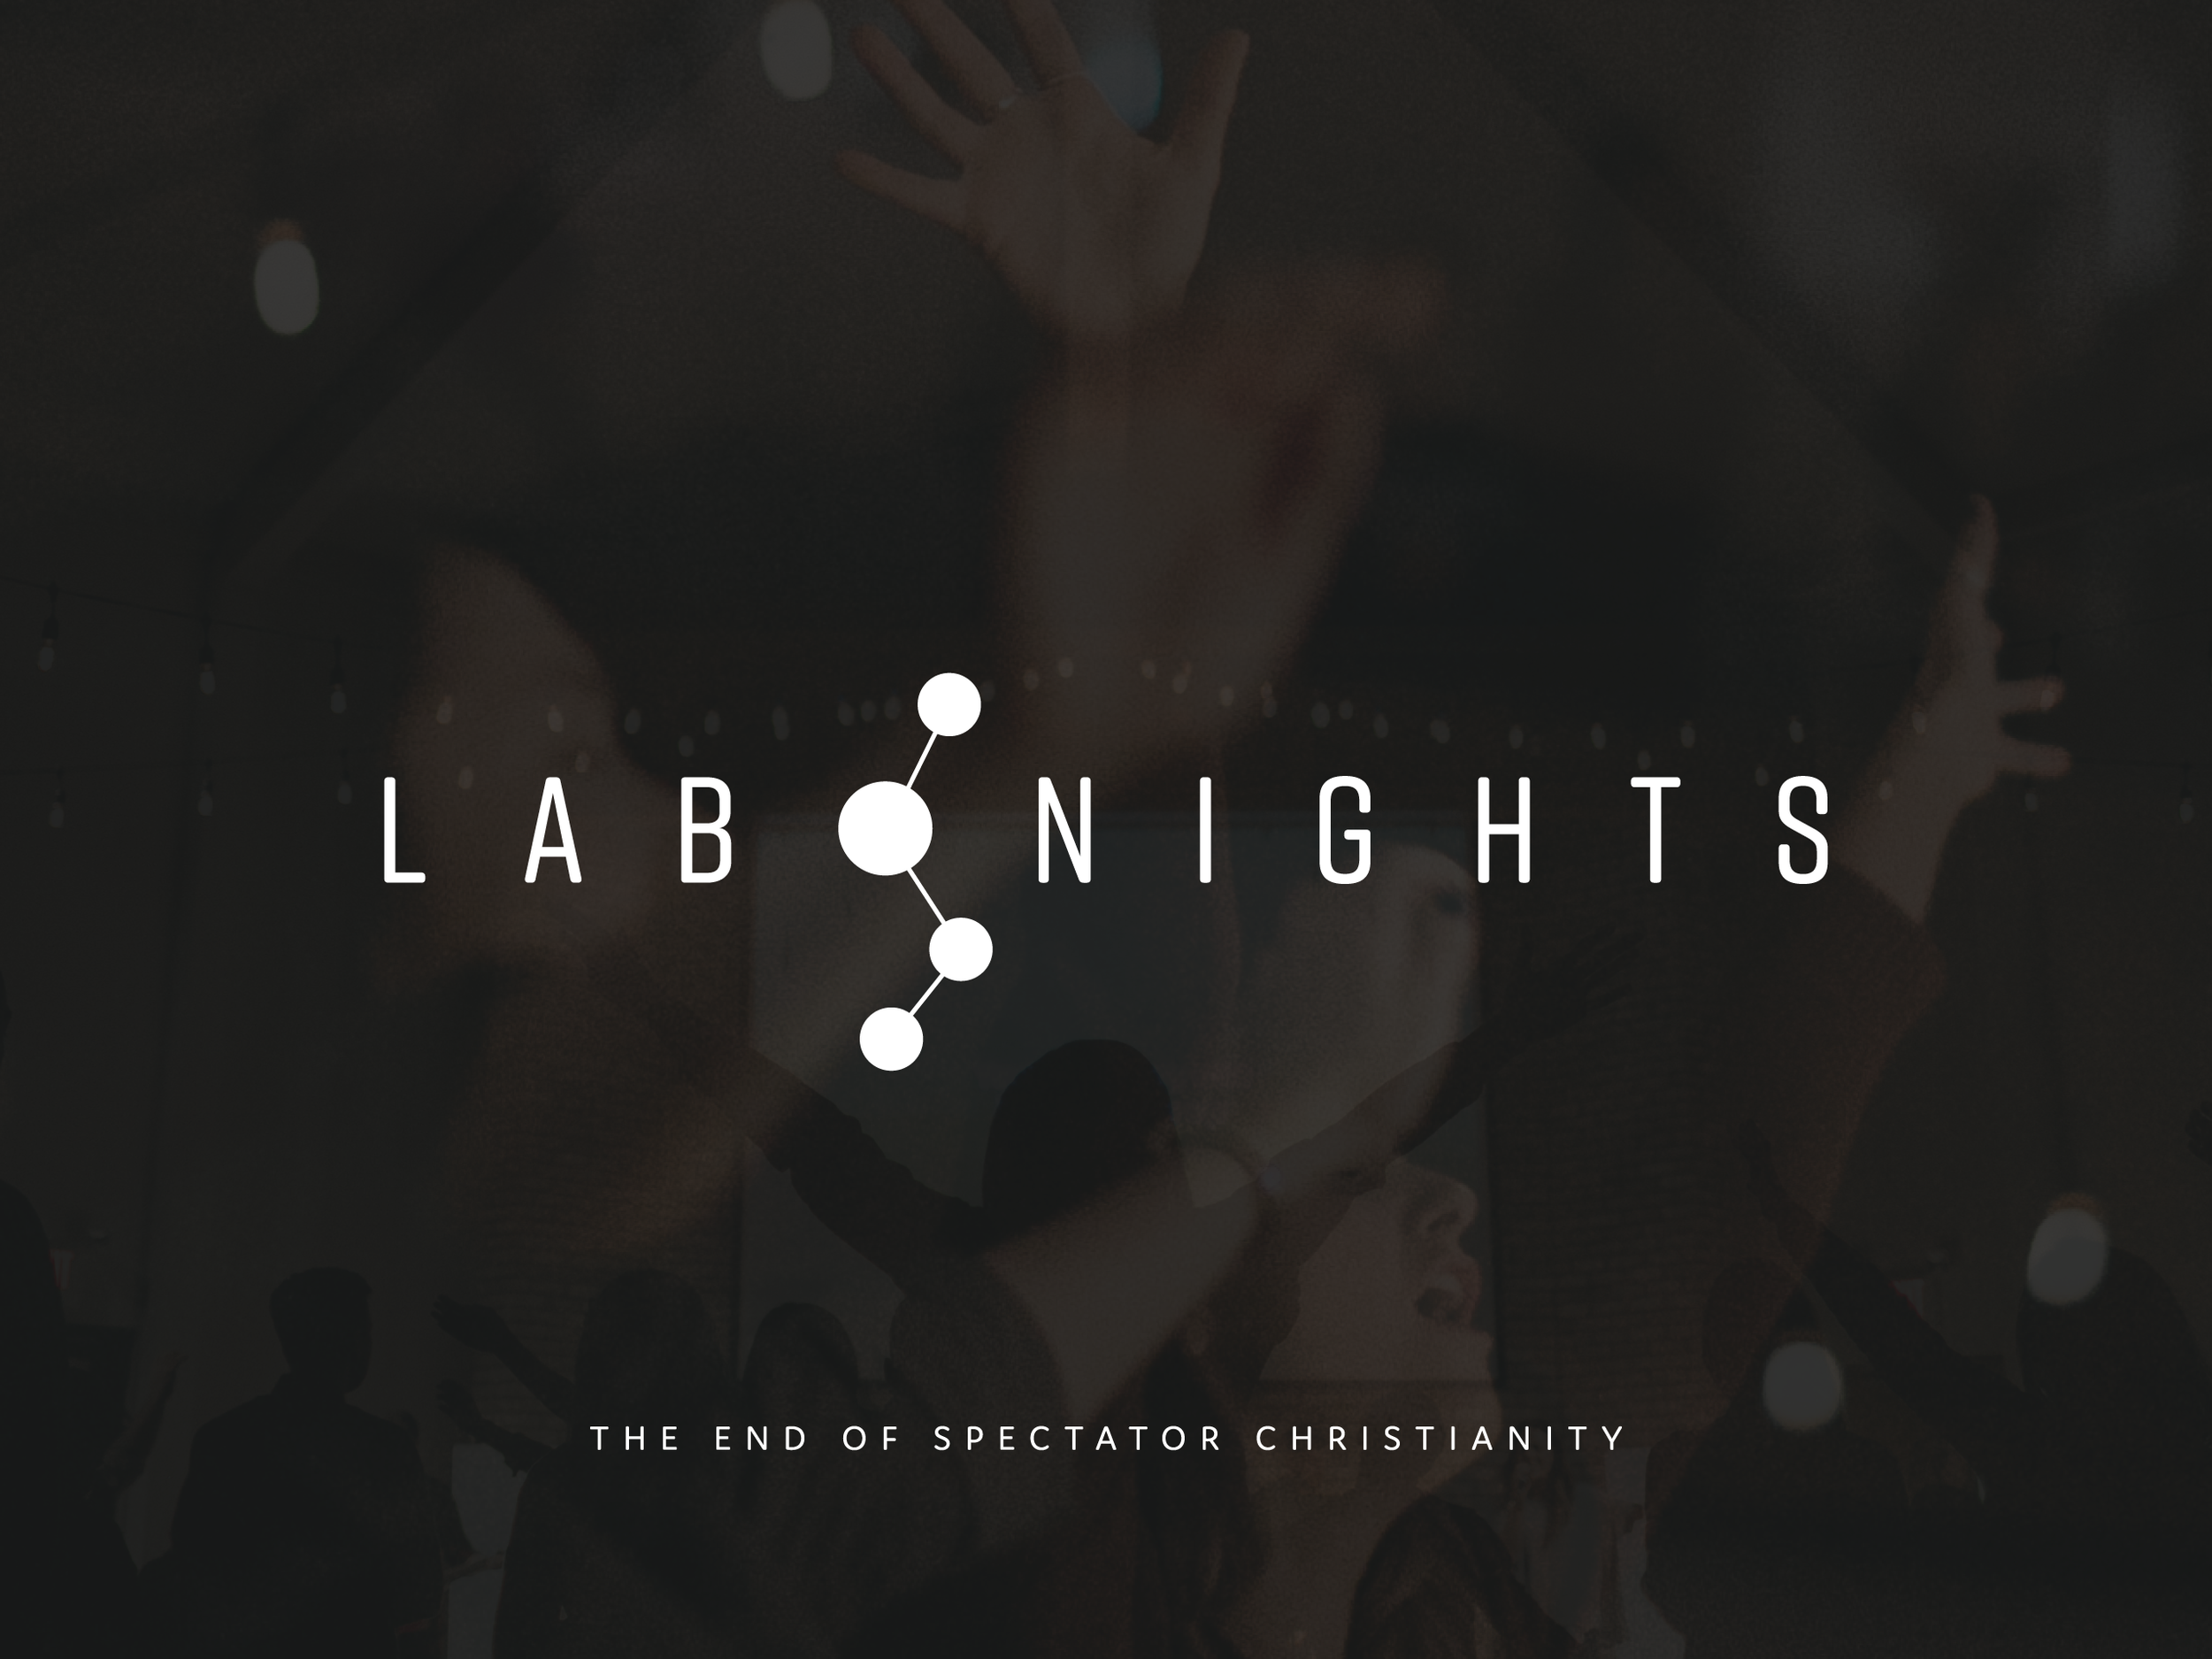 01_labnights_final.png